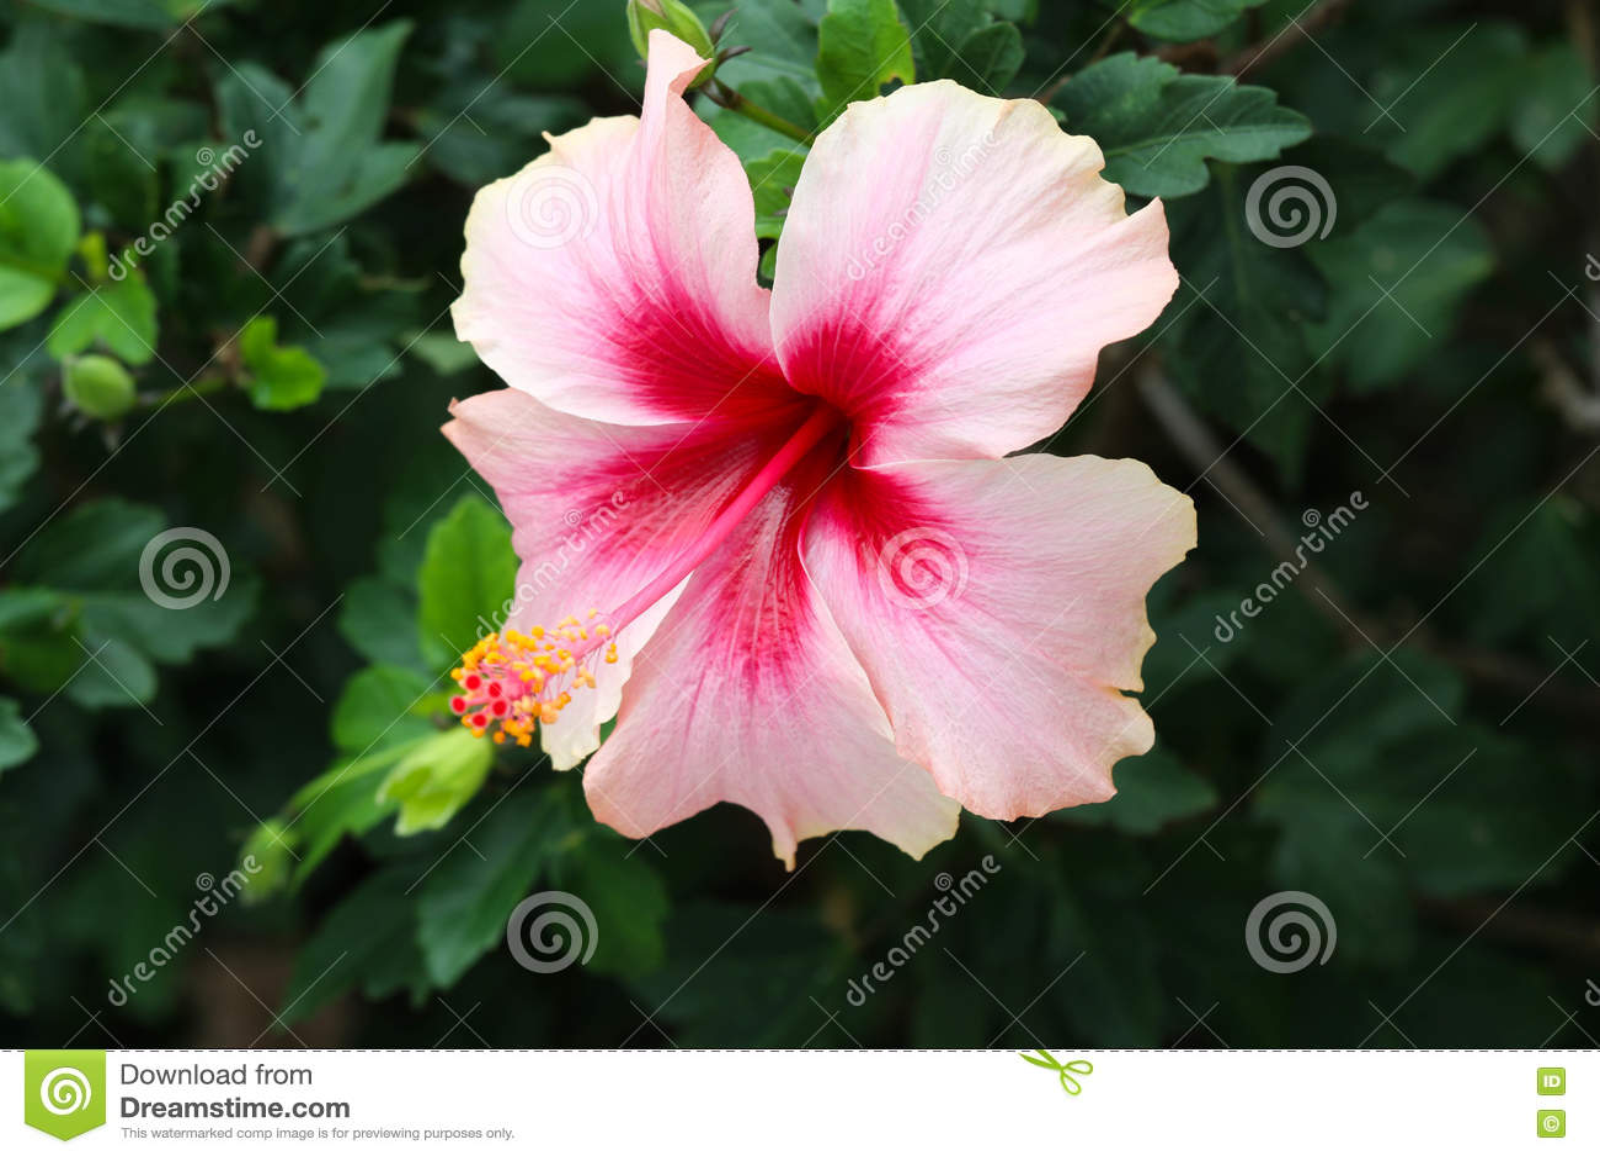 Shoeflowers In The Garden Stock Image Image Of Hawaiian 81985945